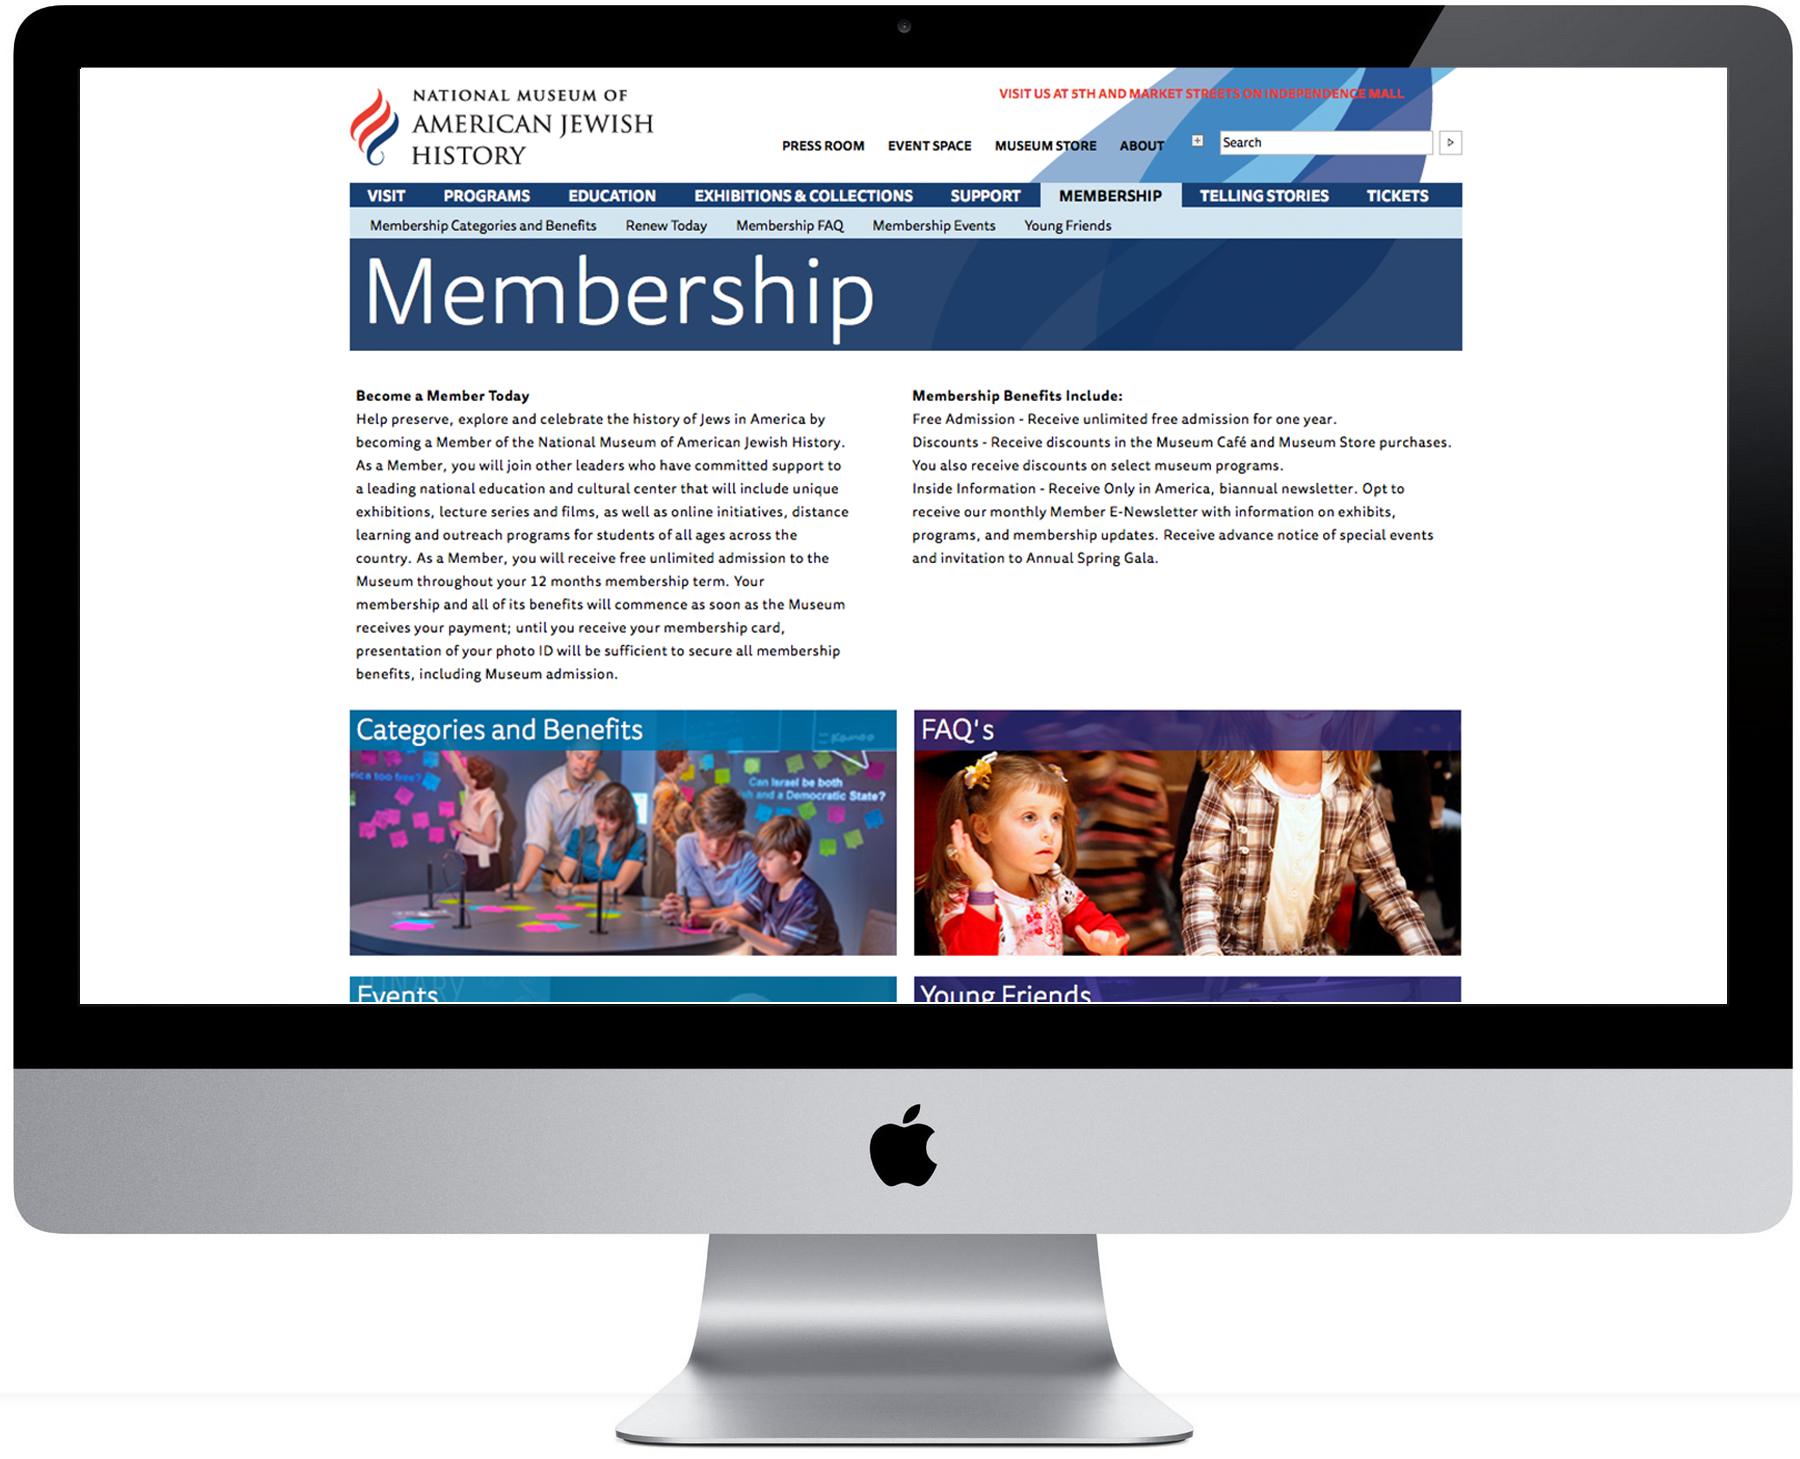 NMAJH_Membership_BEH.jpg